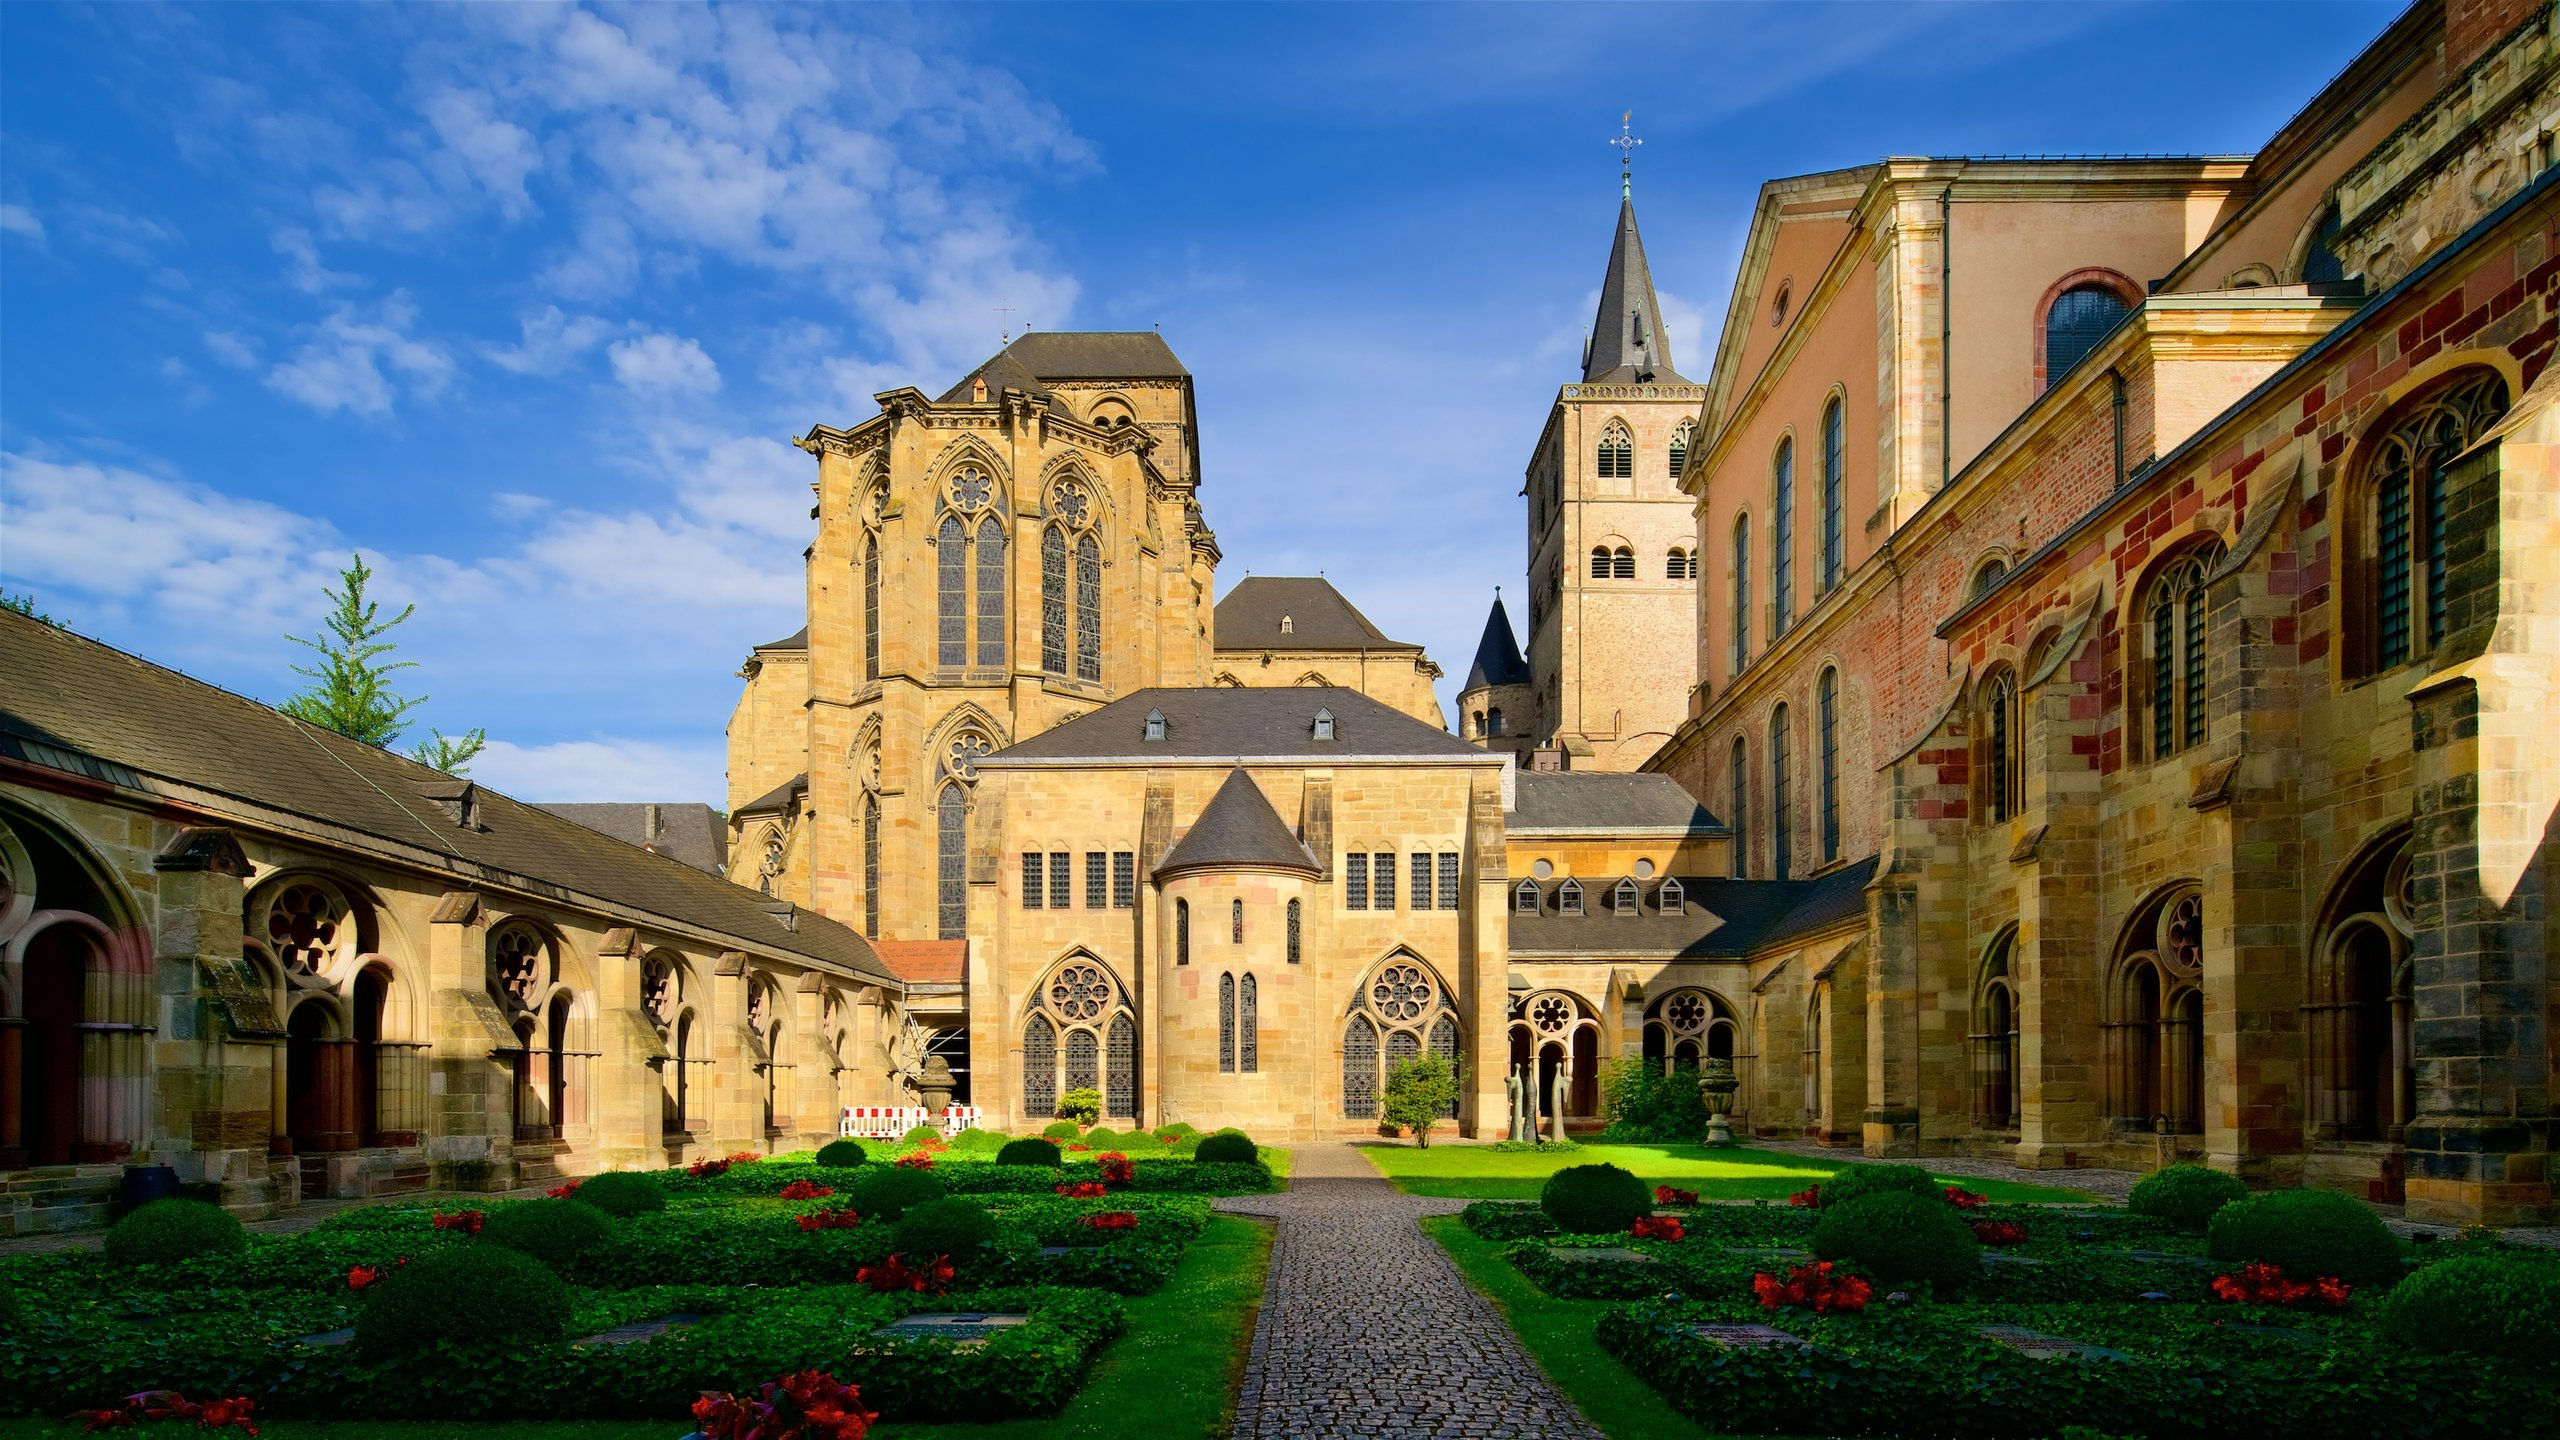 Trier, Rhineland-Palatinate, Germany